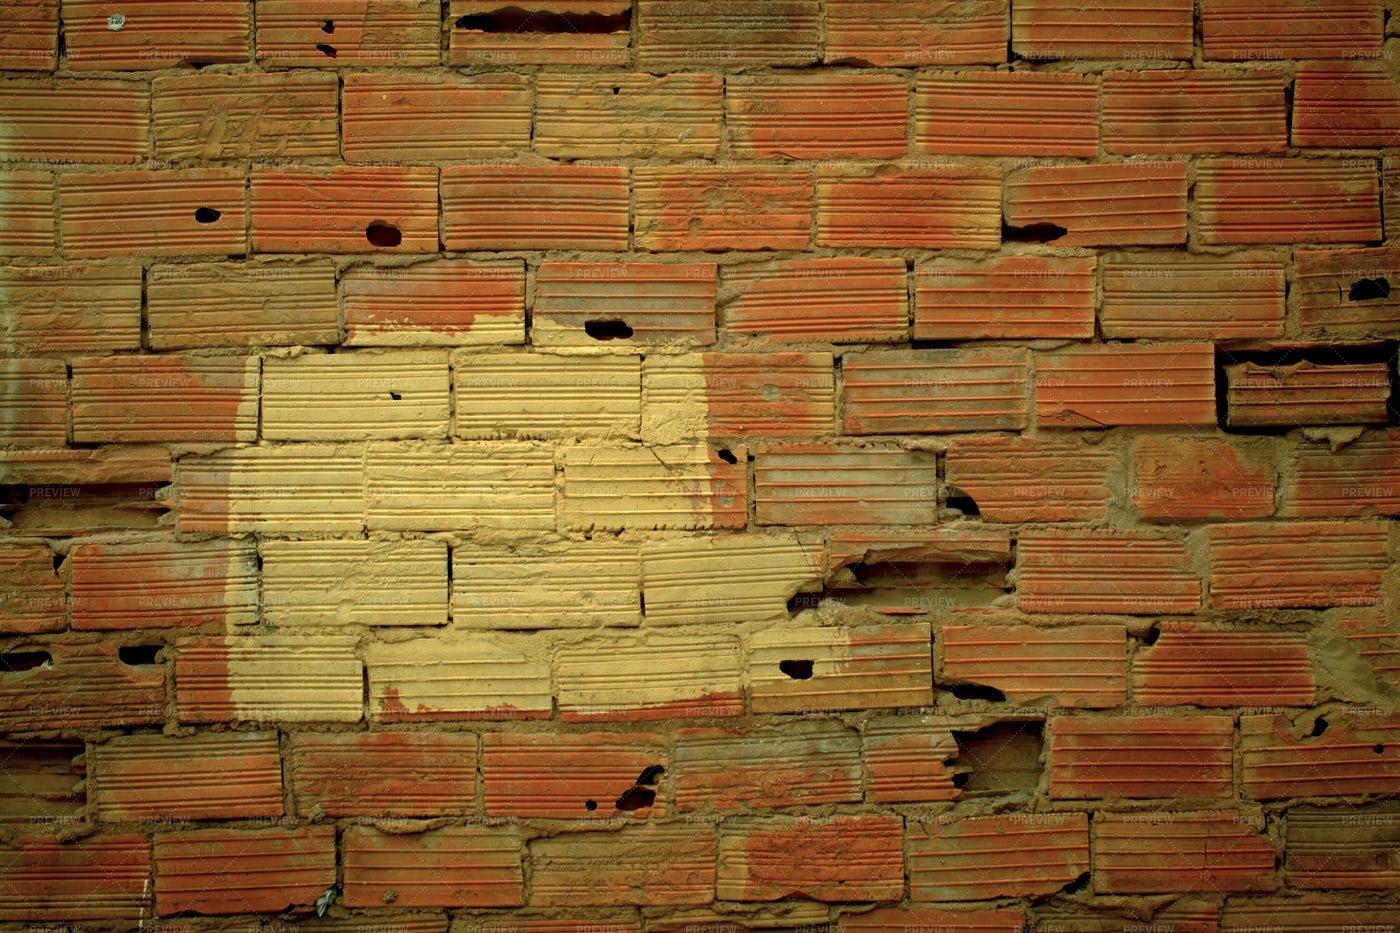 Old Damaged Wall Texture: Stock Photos